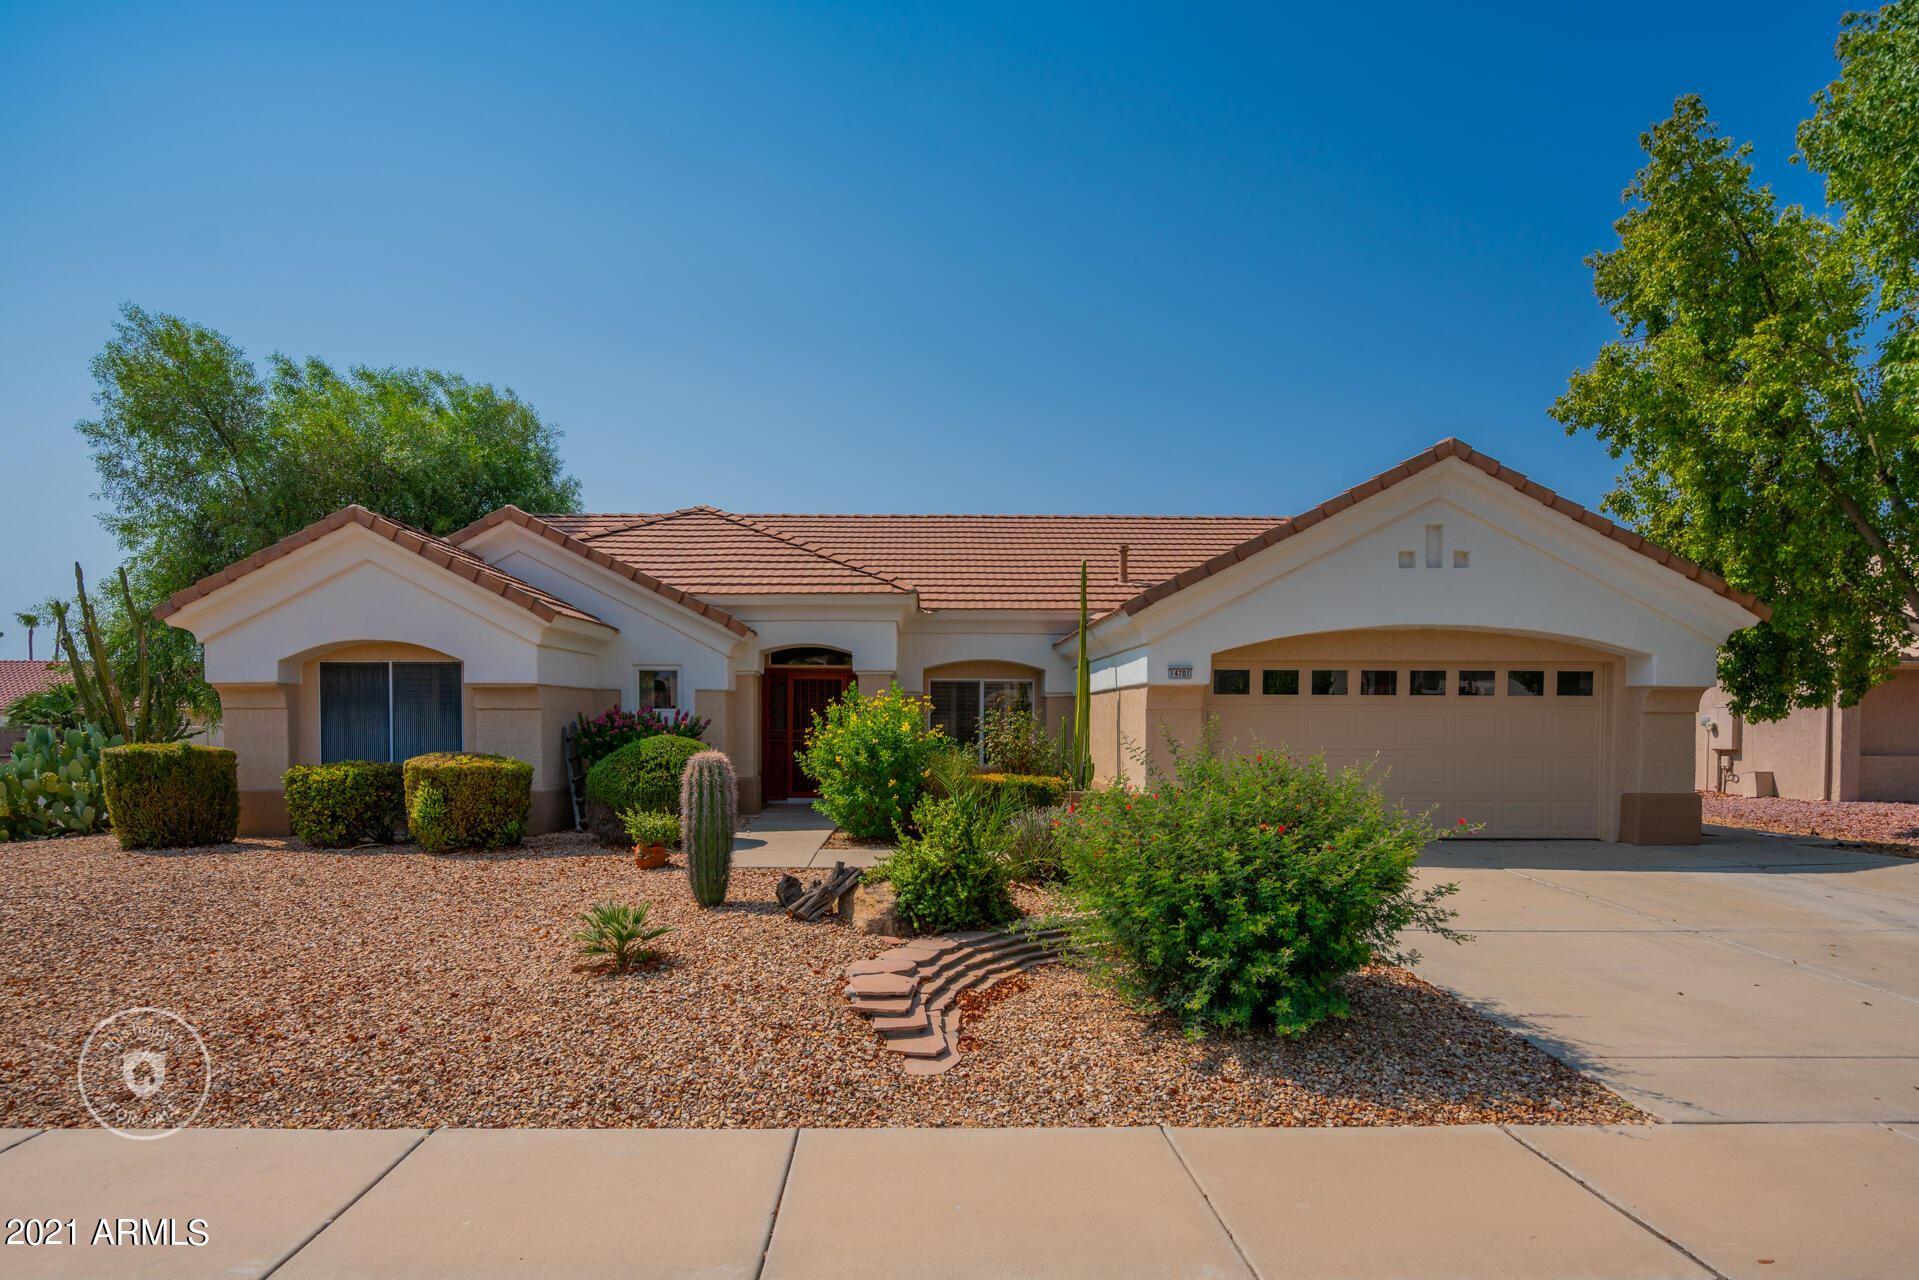 Photo of 14701 W SENTINEL Drive, Sun City West, AZ 85375 (MLS # 6268587)